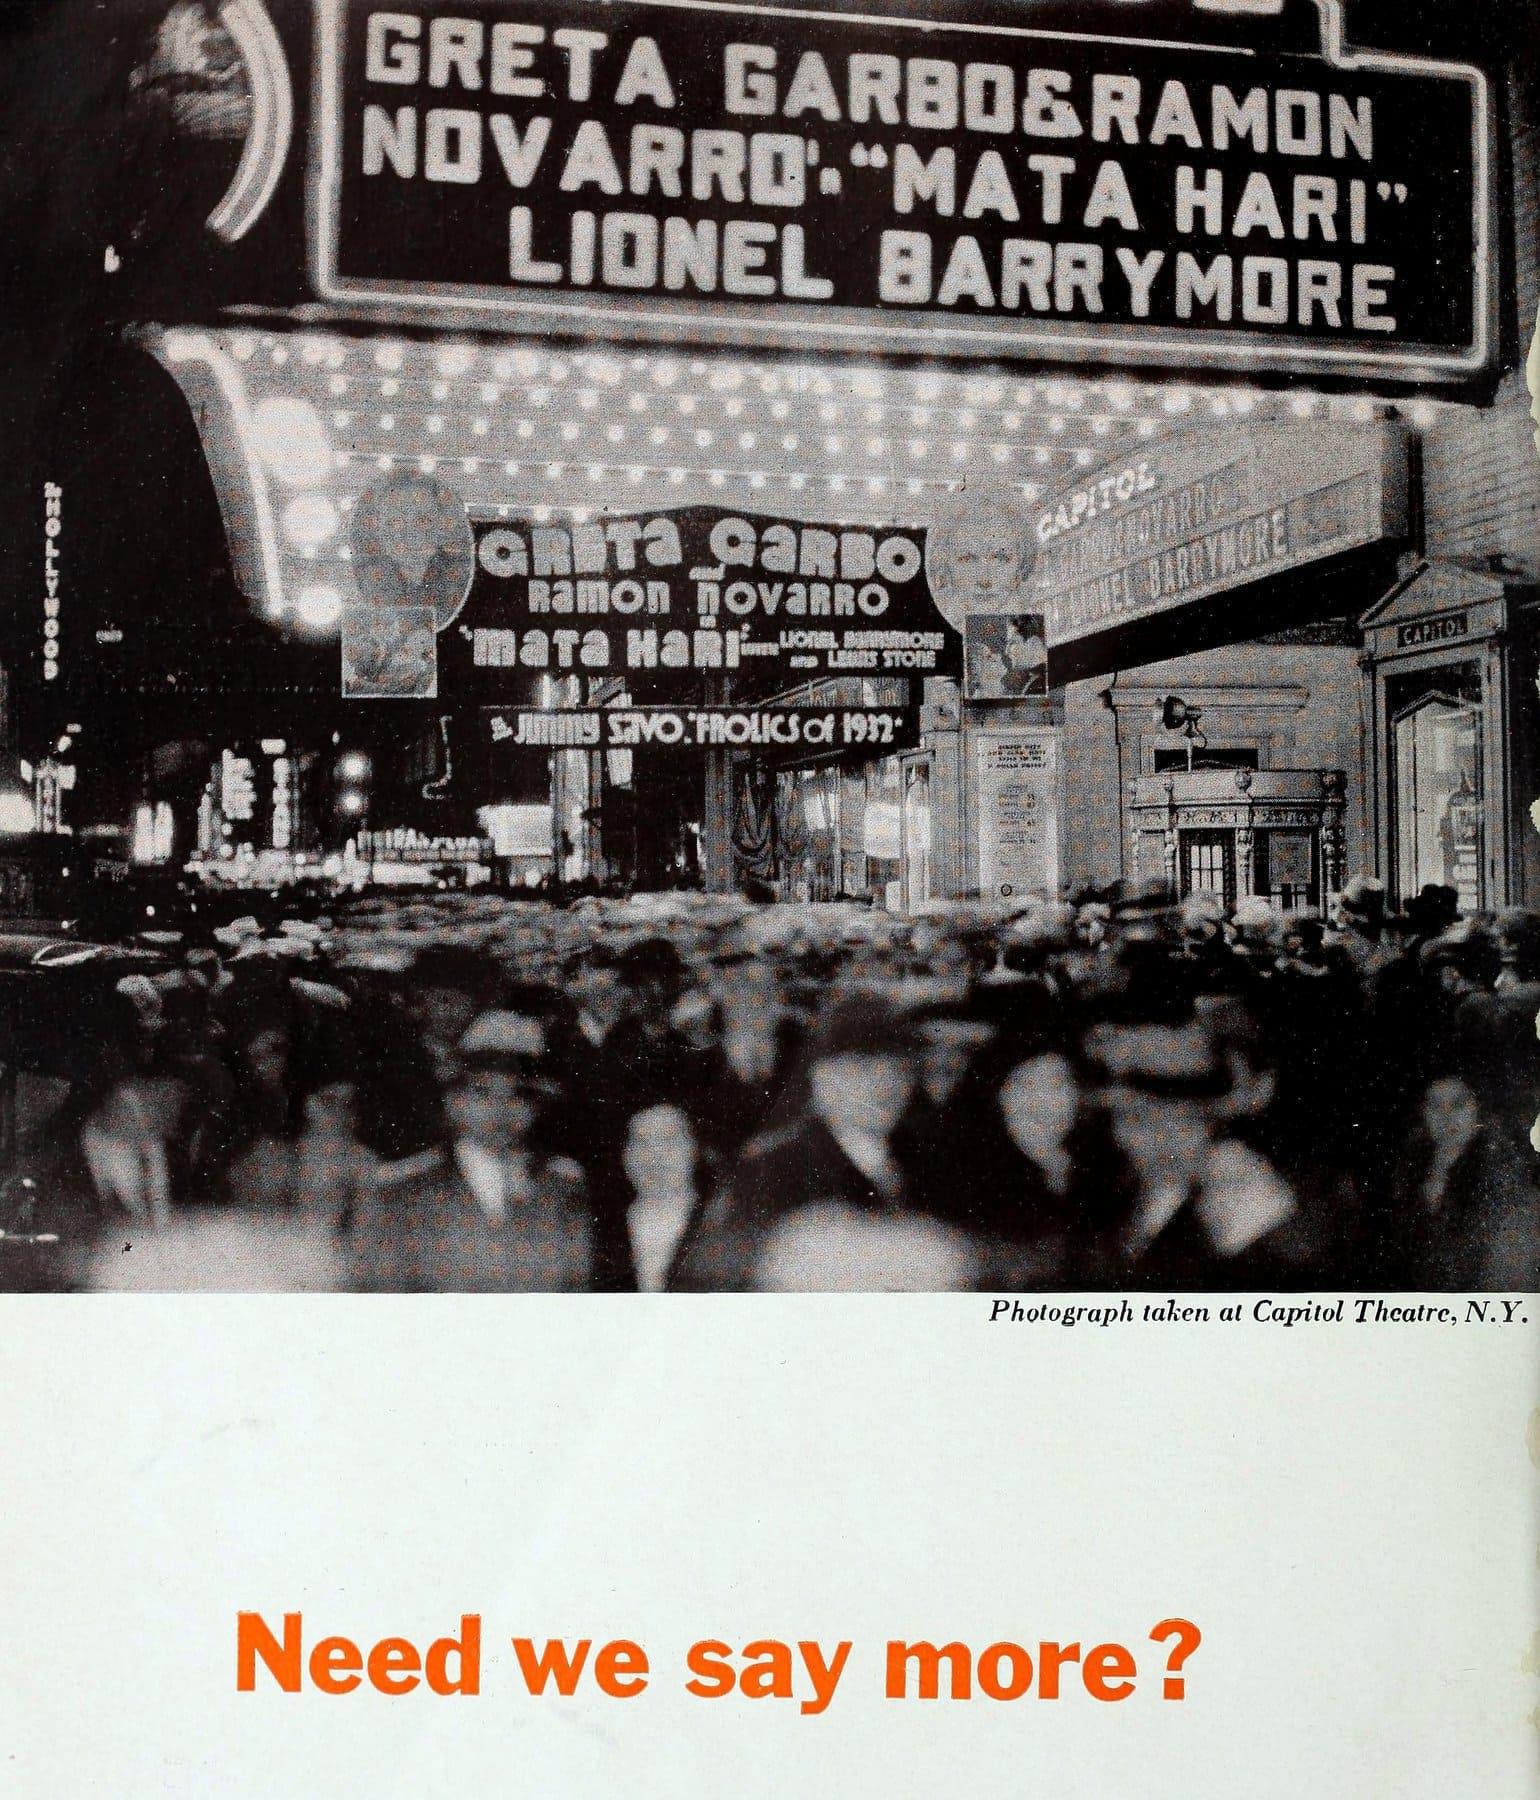 Greta Garbo - Mata Hari movie theater marquee (1932)